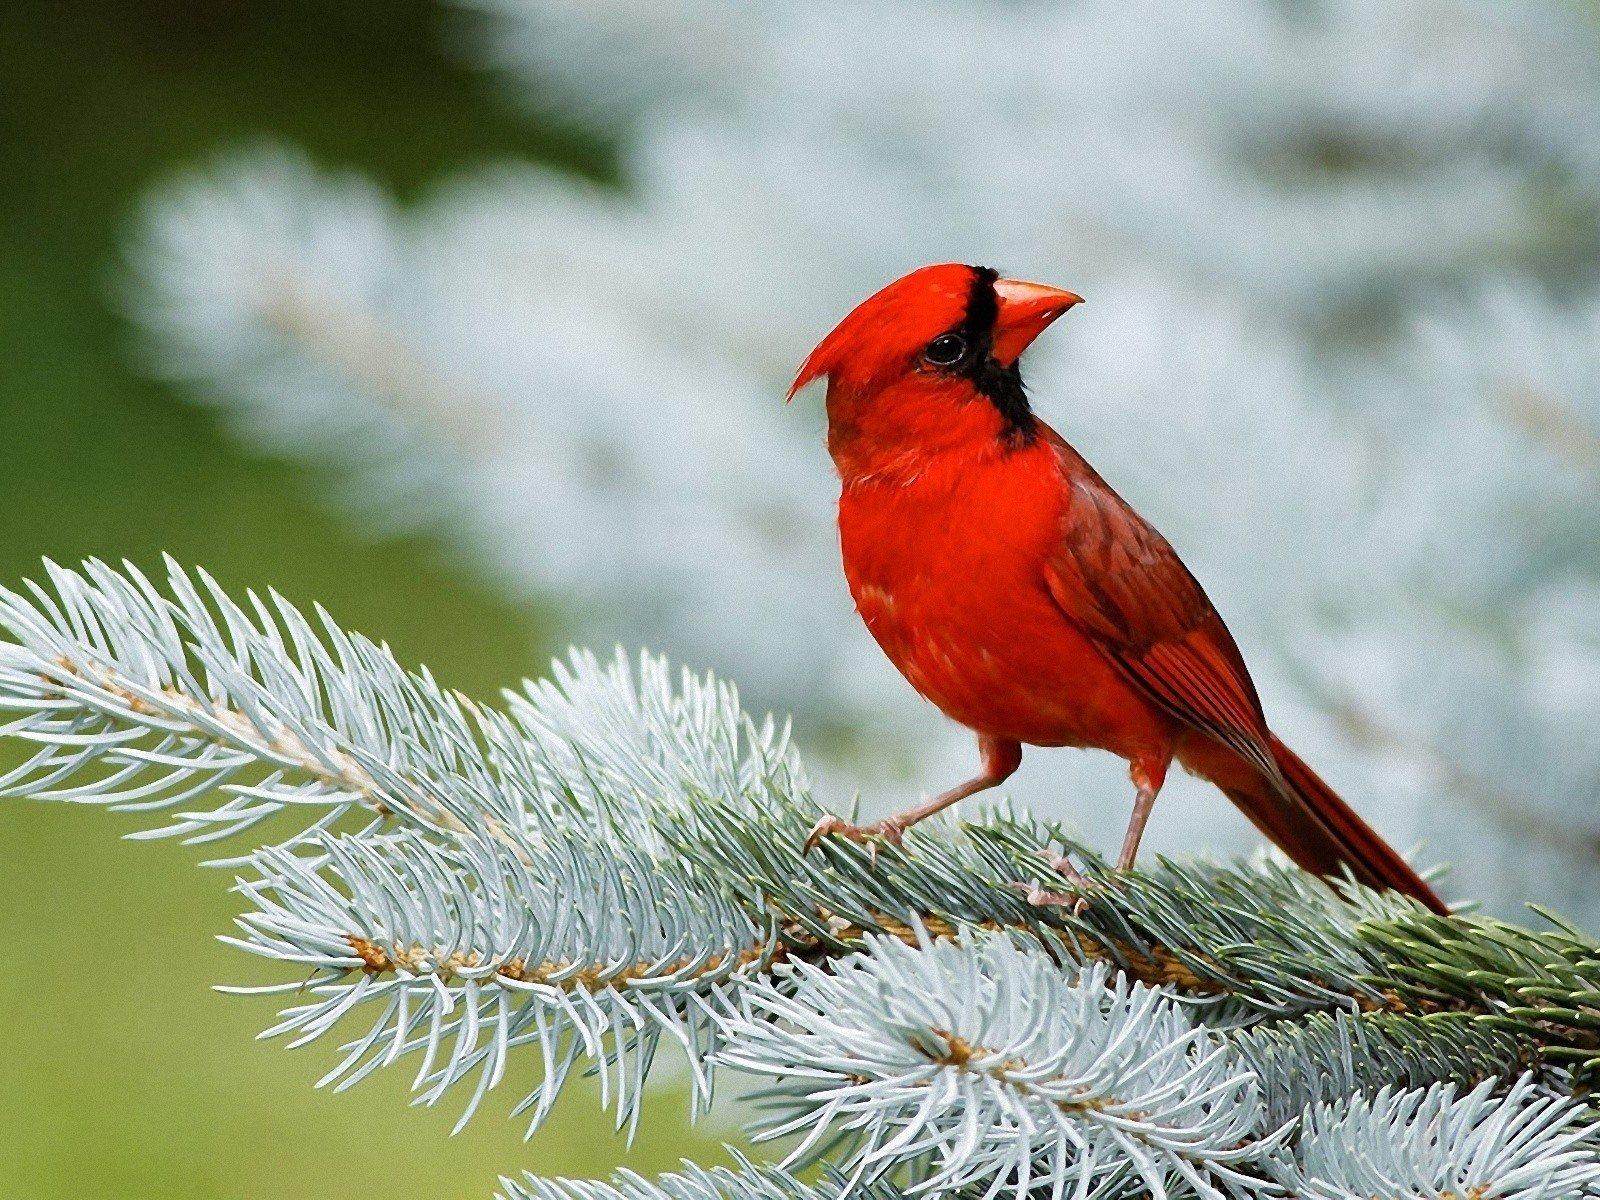 Northern Cardinal Habits